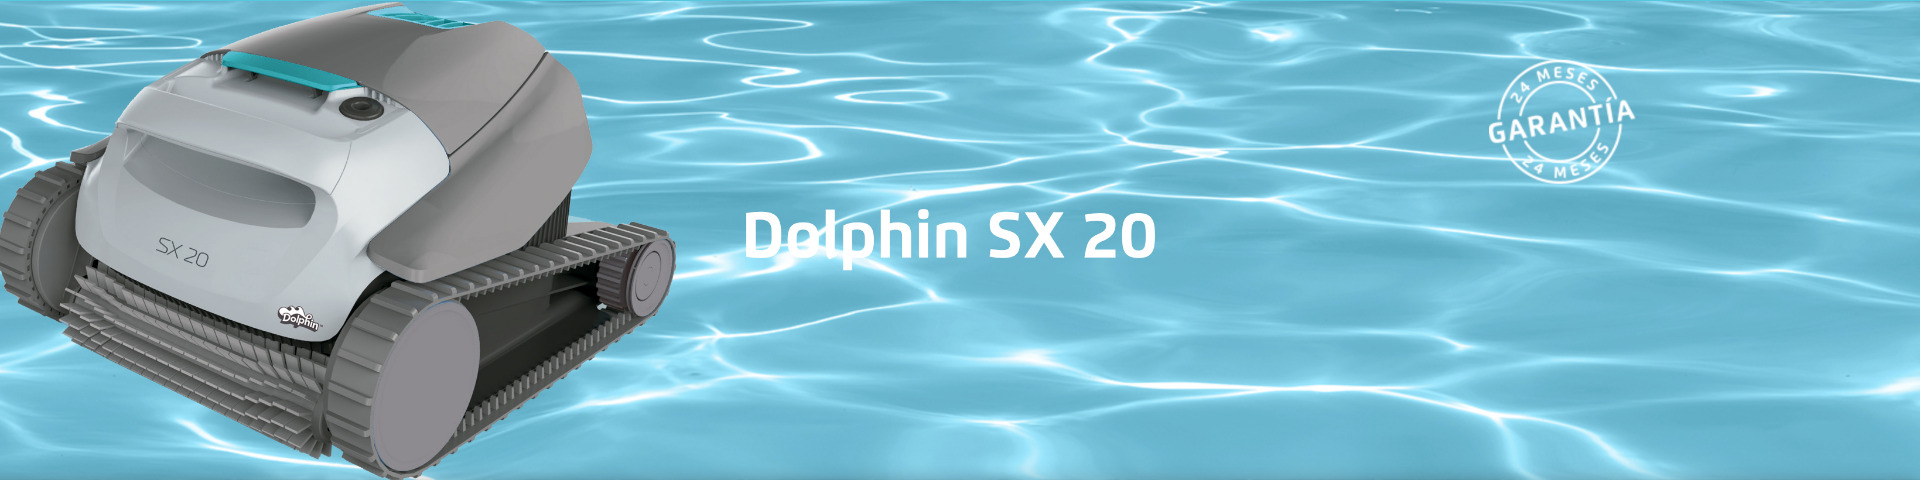 Dolphin SX 20